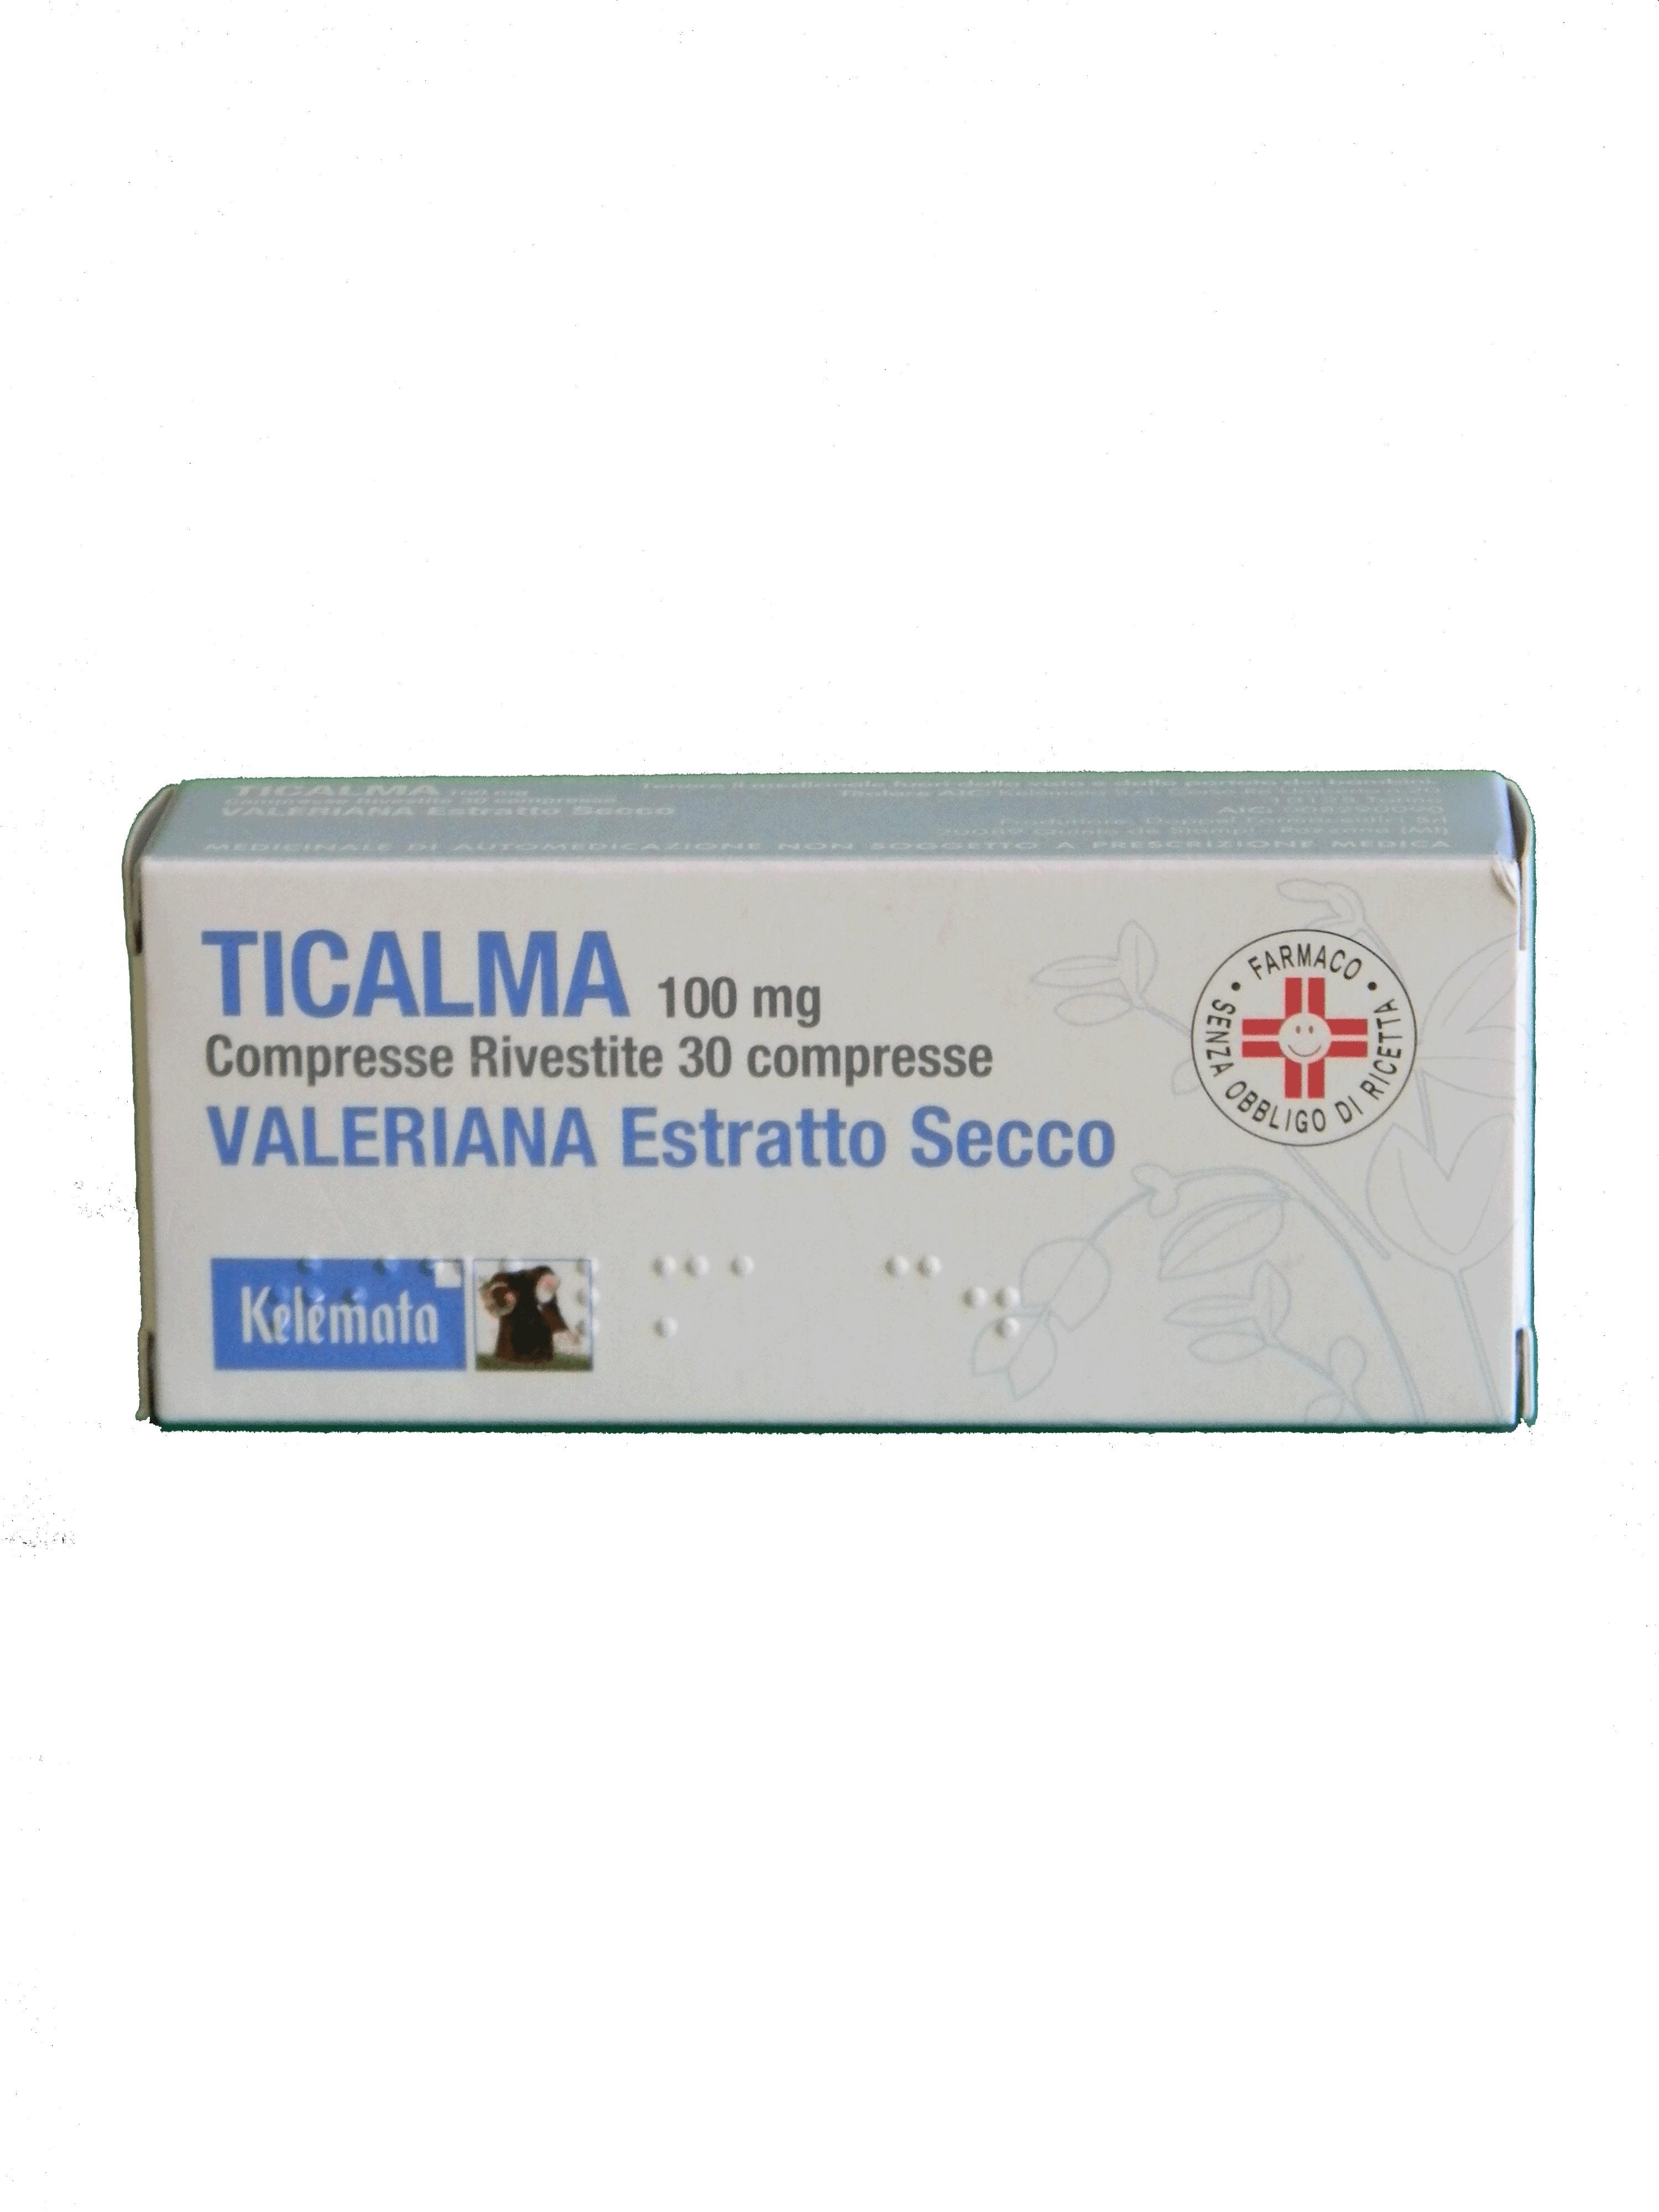 TICALMA*30CPR RIV 100MG - Spacefarma.it